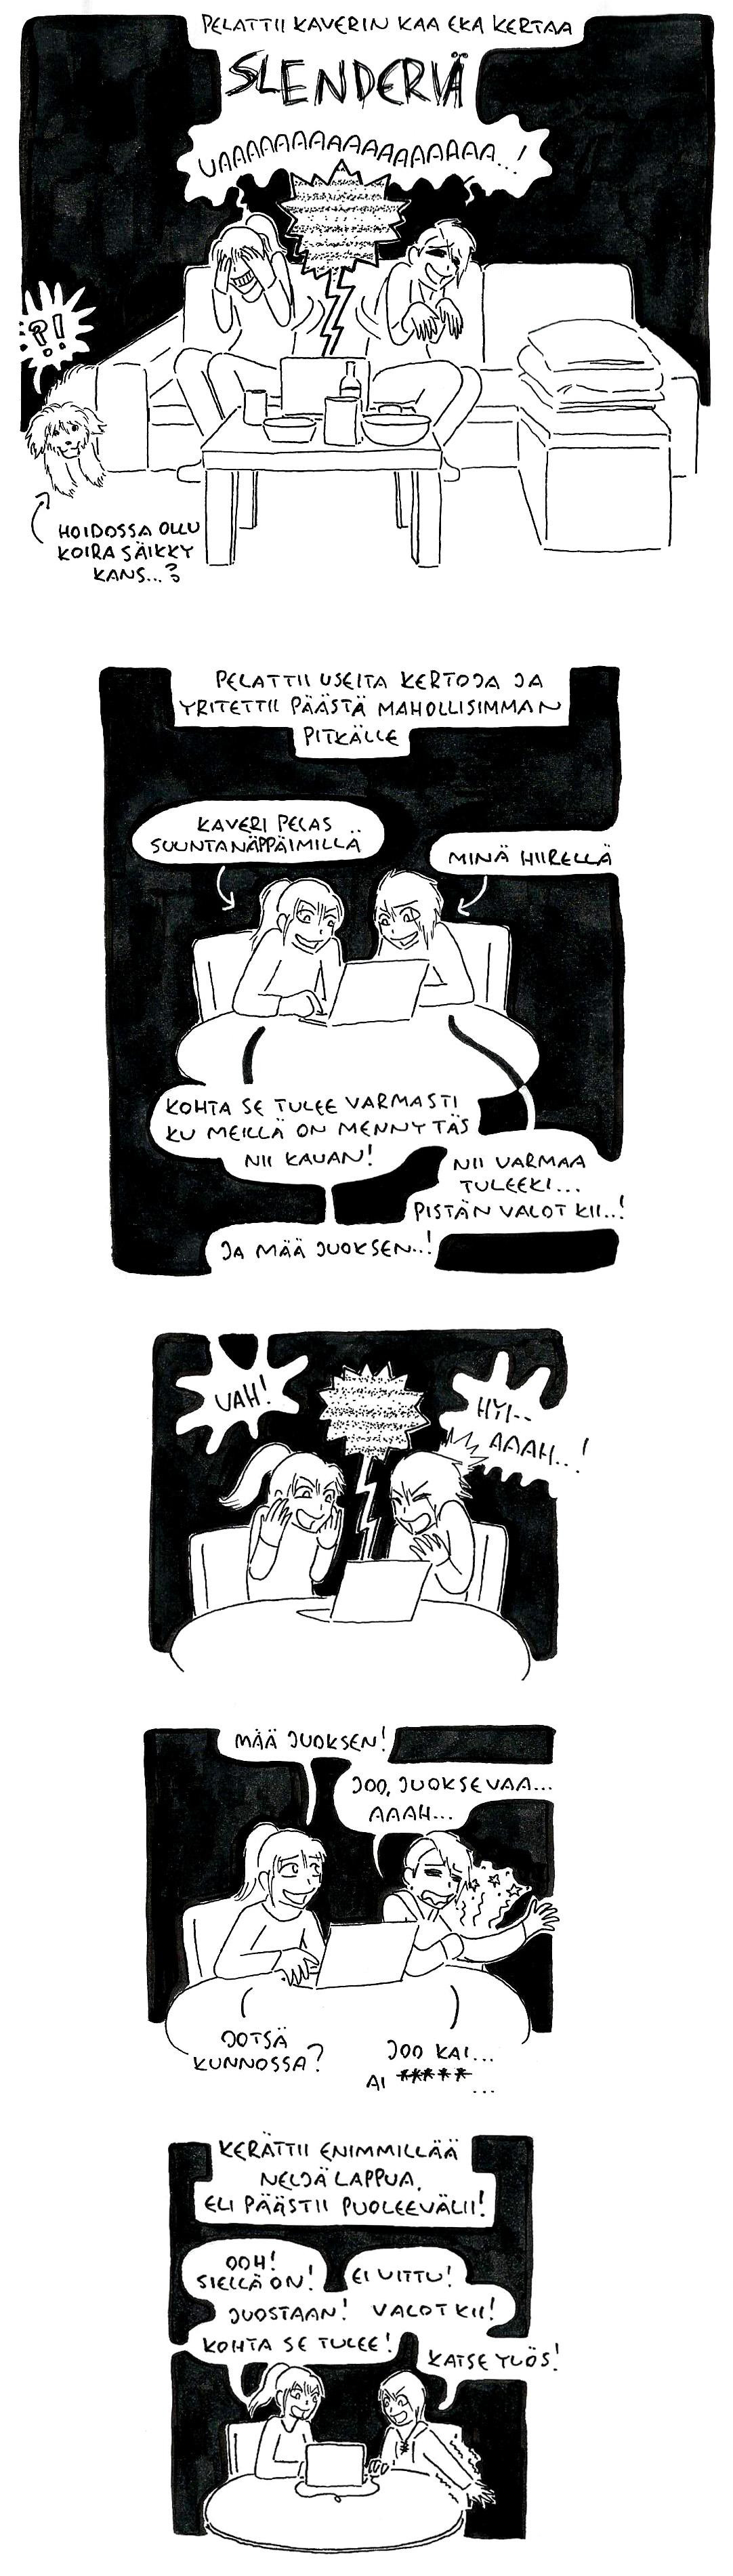 saerjis434